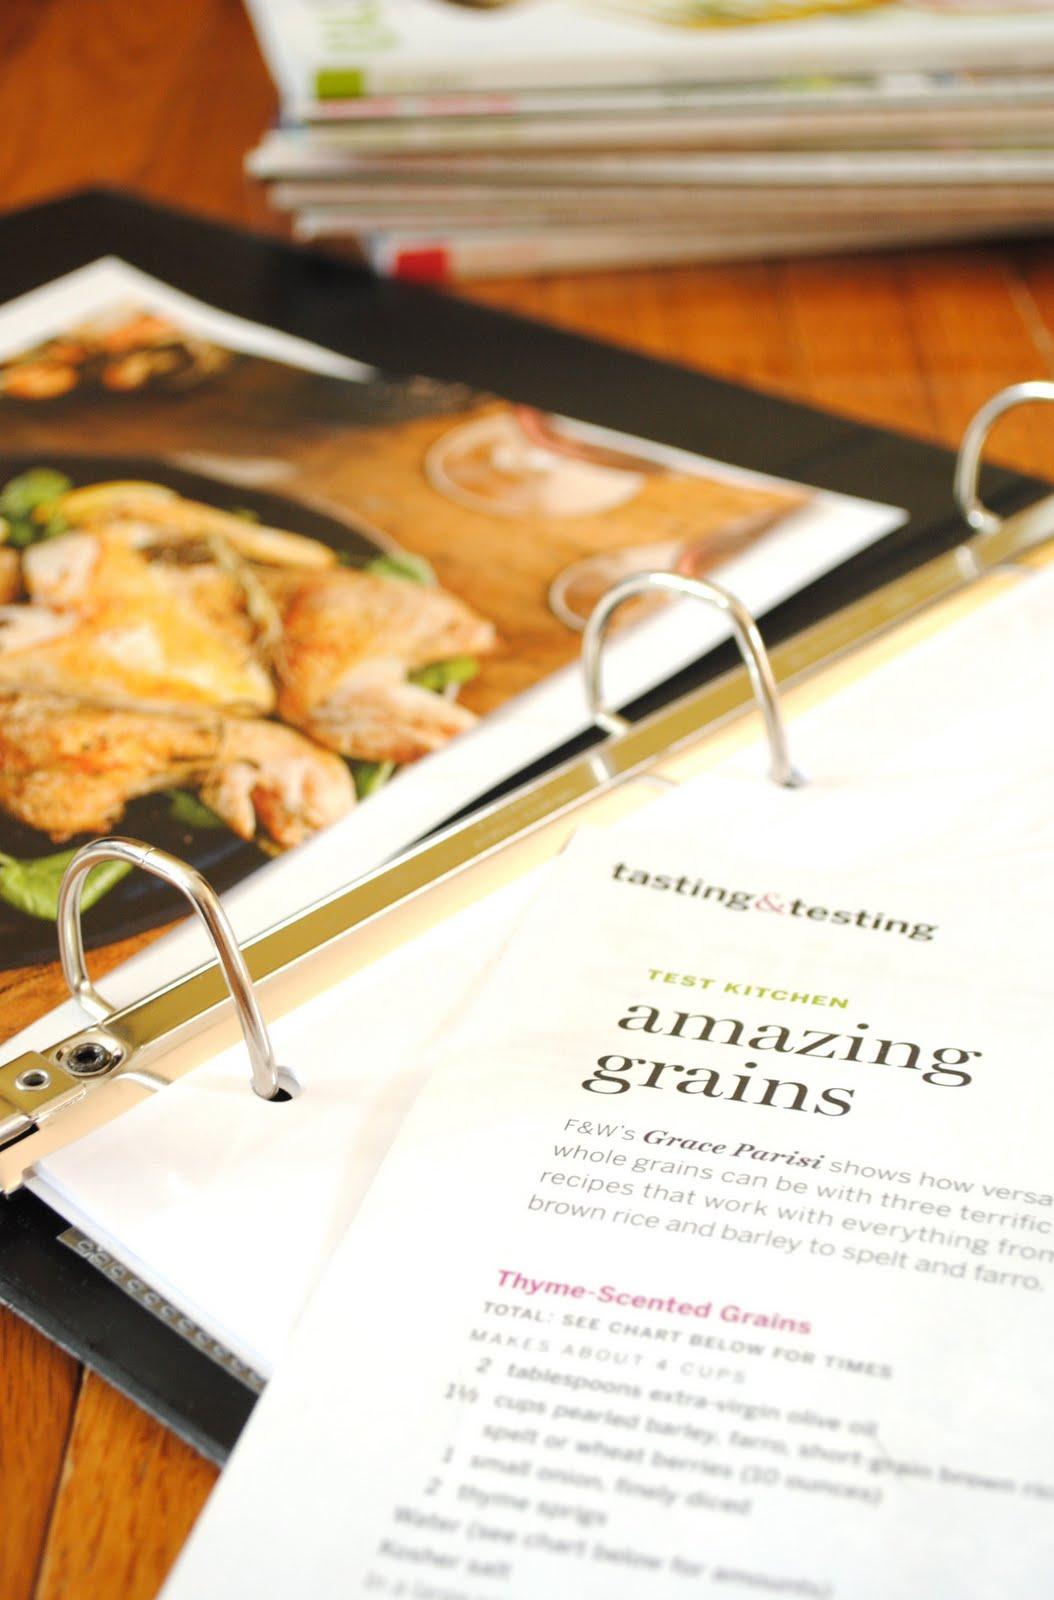 Food ideas magazine recipes super food ideas newsstand on google 83 food ideas magazine super food ideas ideas magazine seventeen forumfinder Image collections